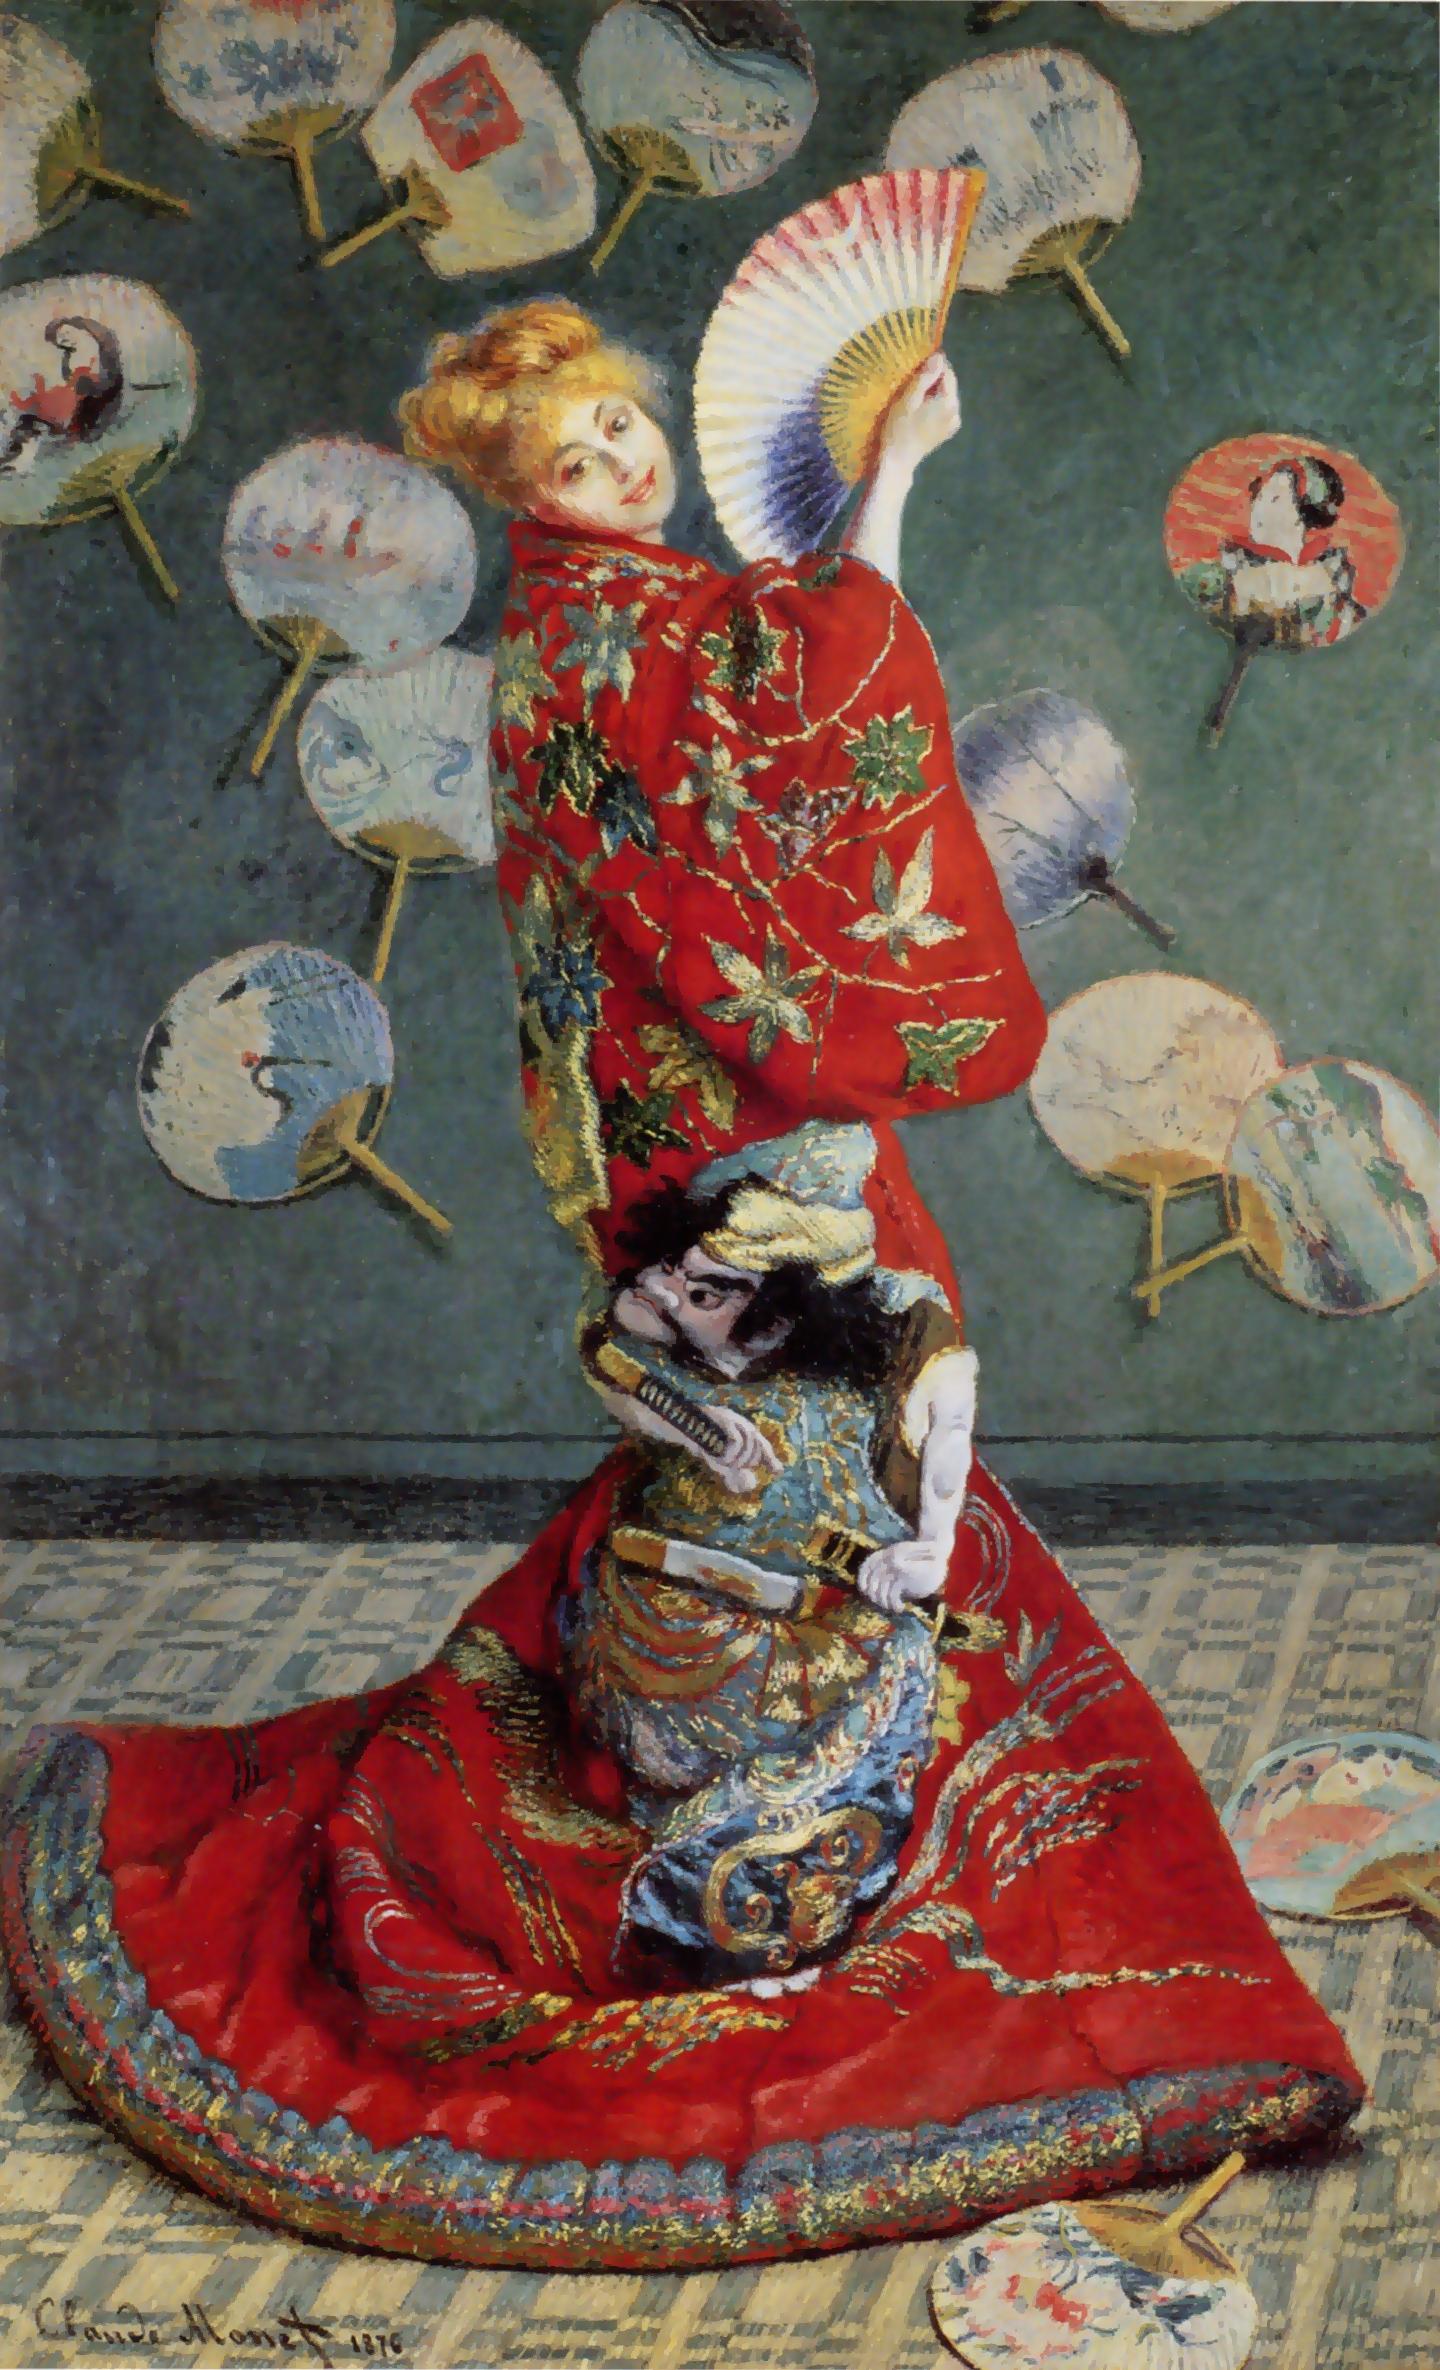 https://upload.wikimedia.org/wikipedia/commons/9/99/Claude_Monet-Madame_Monet_en_costume_japonais.jpg